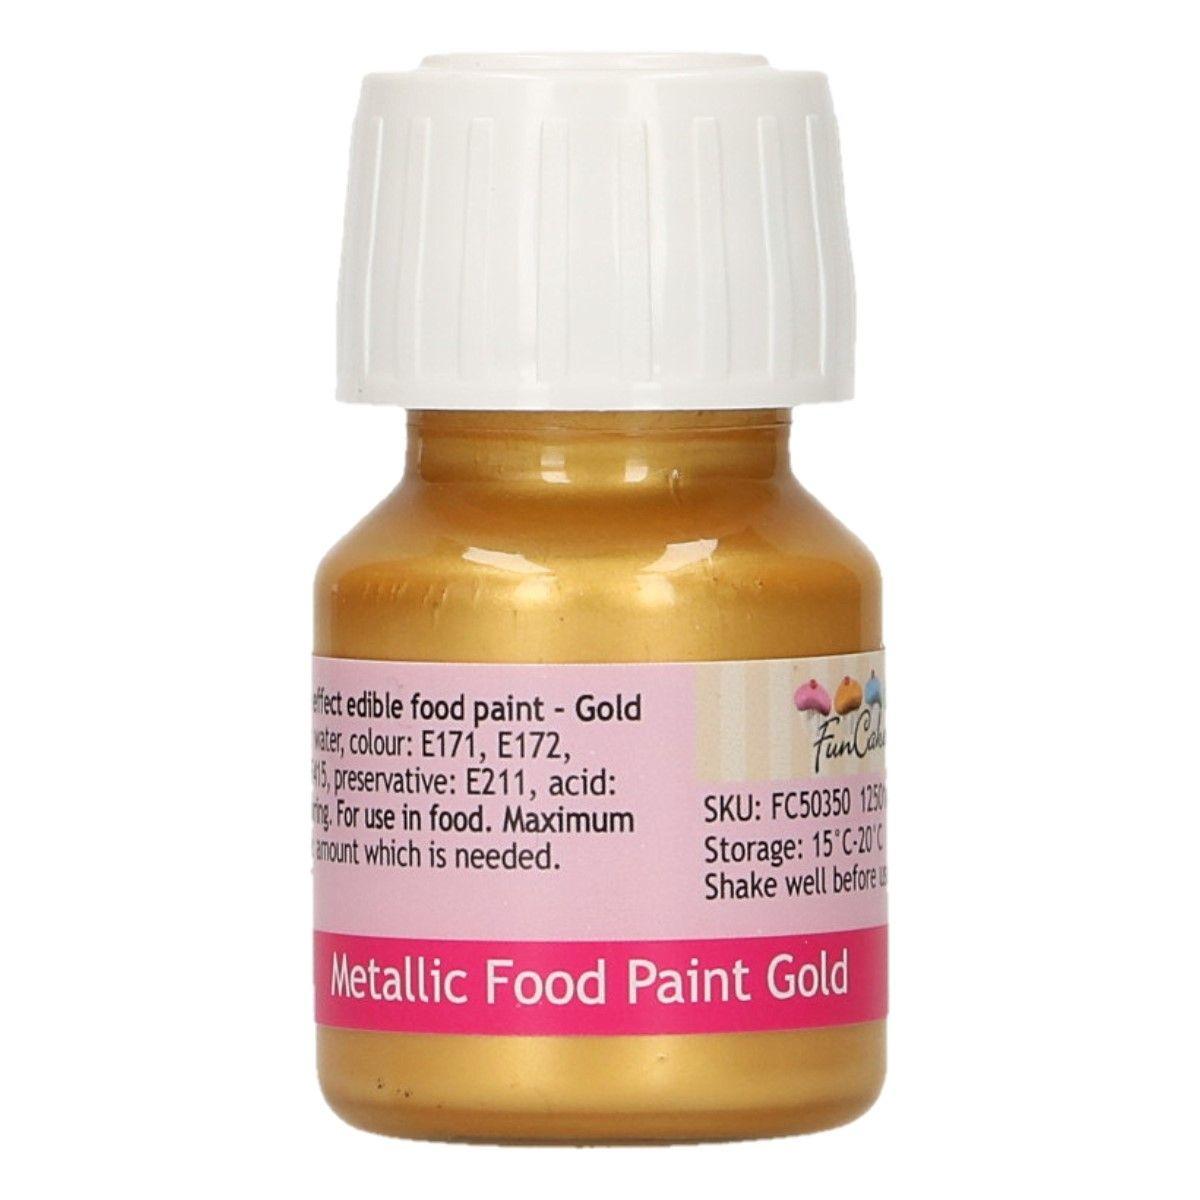 FunColours Metallic Food Paint Gold